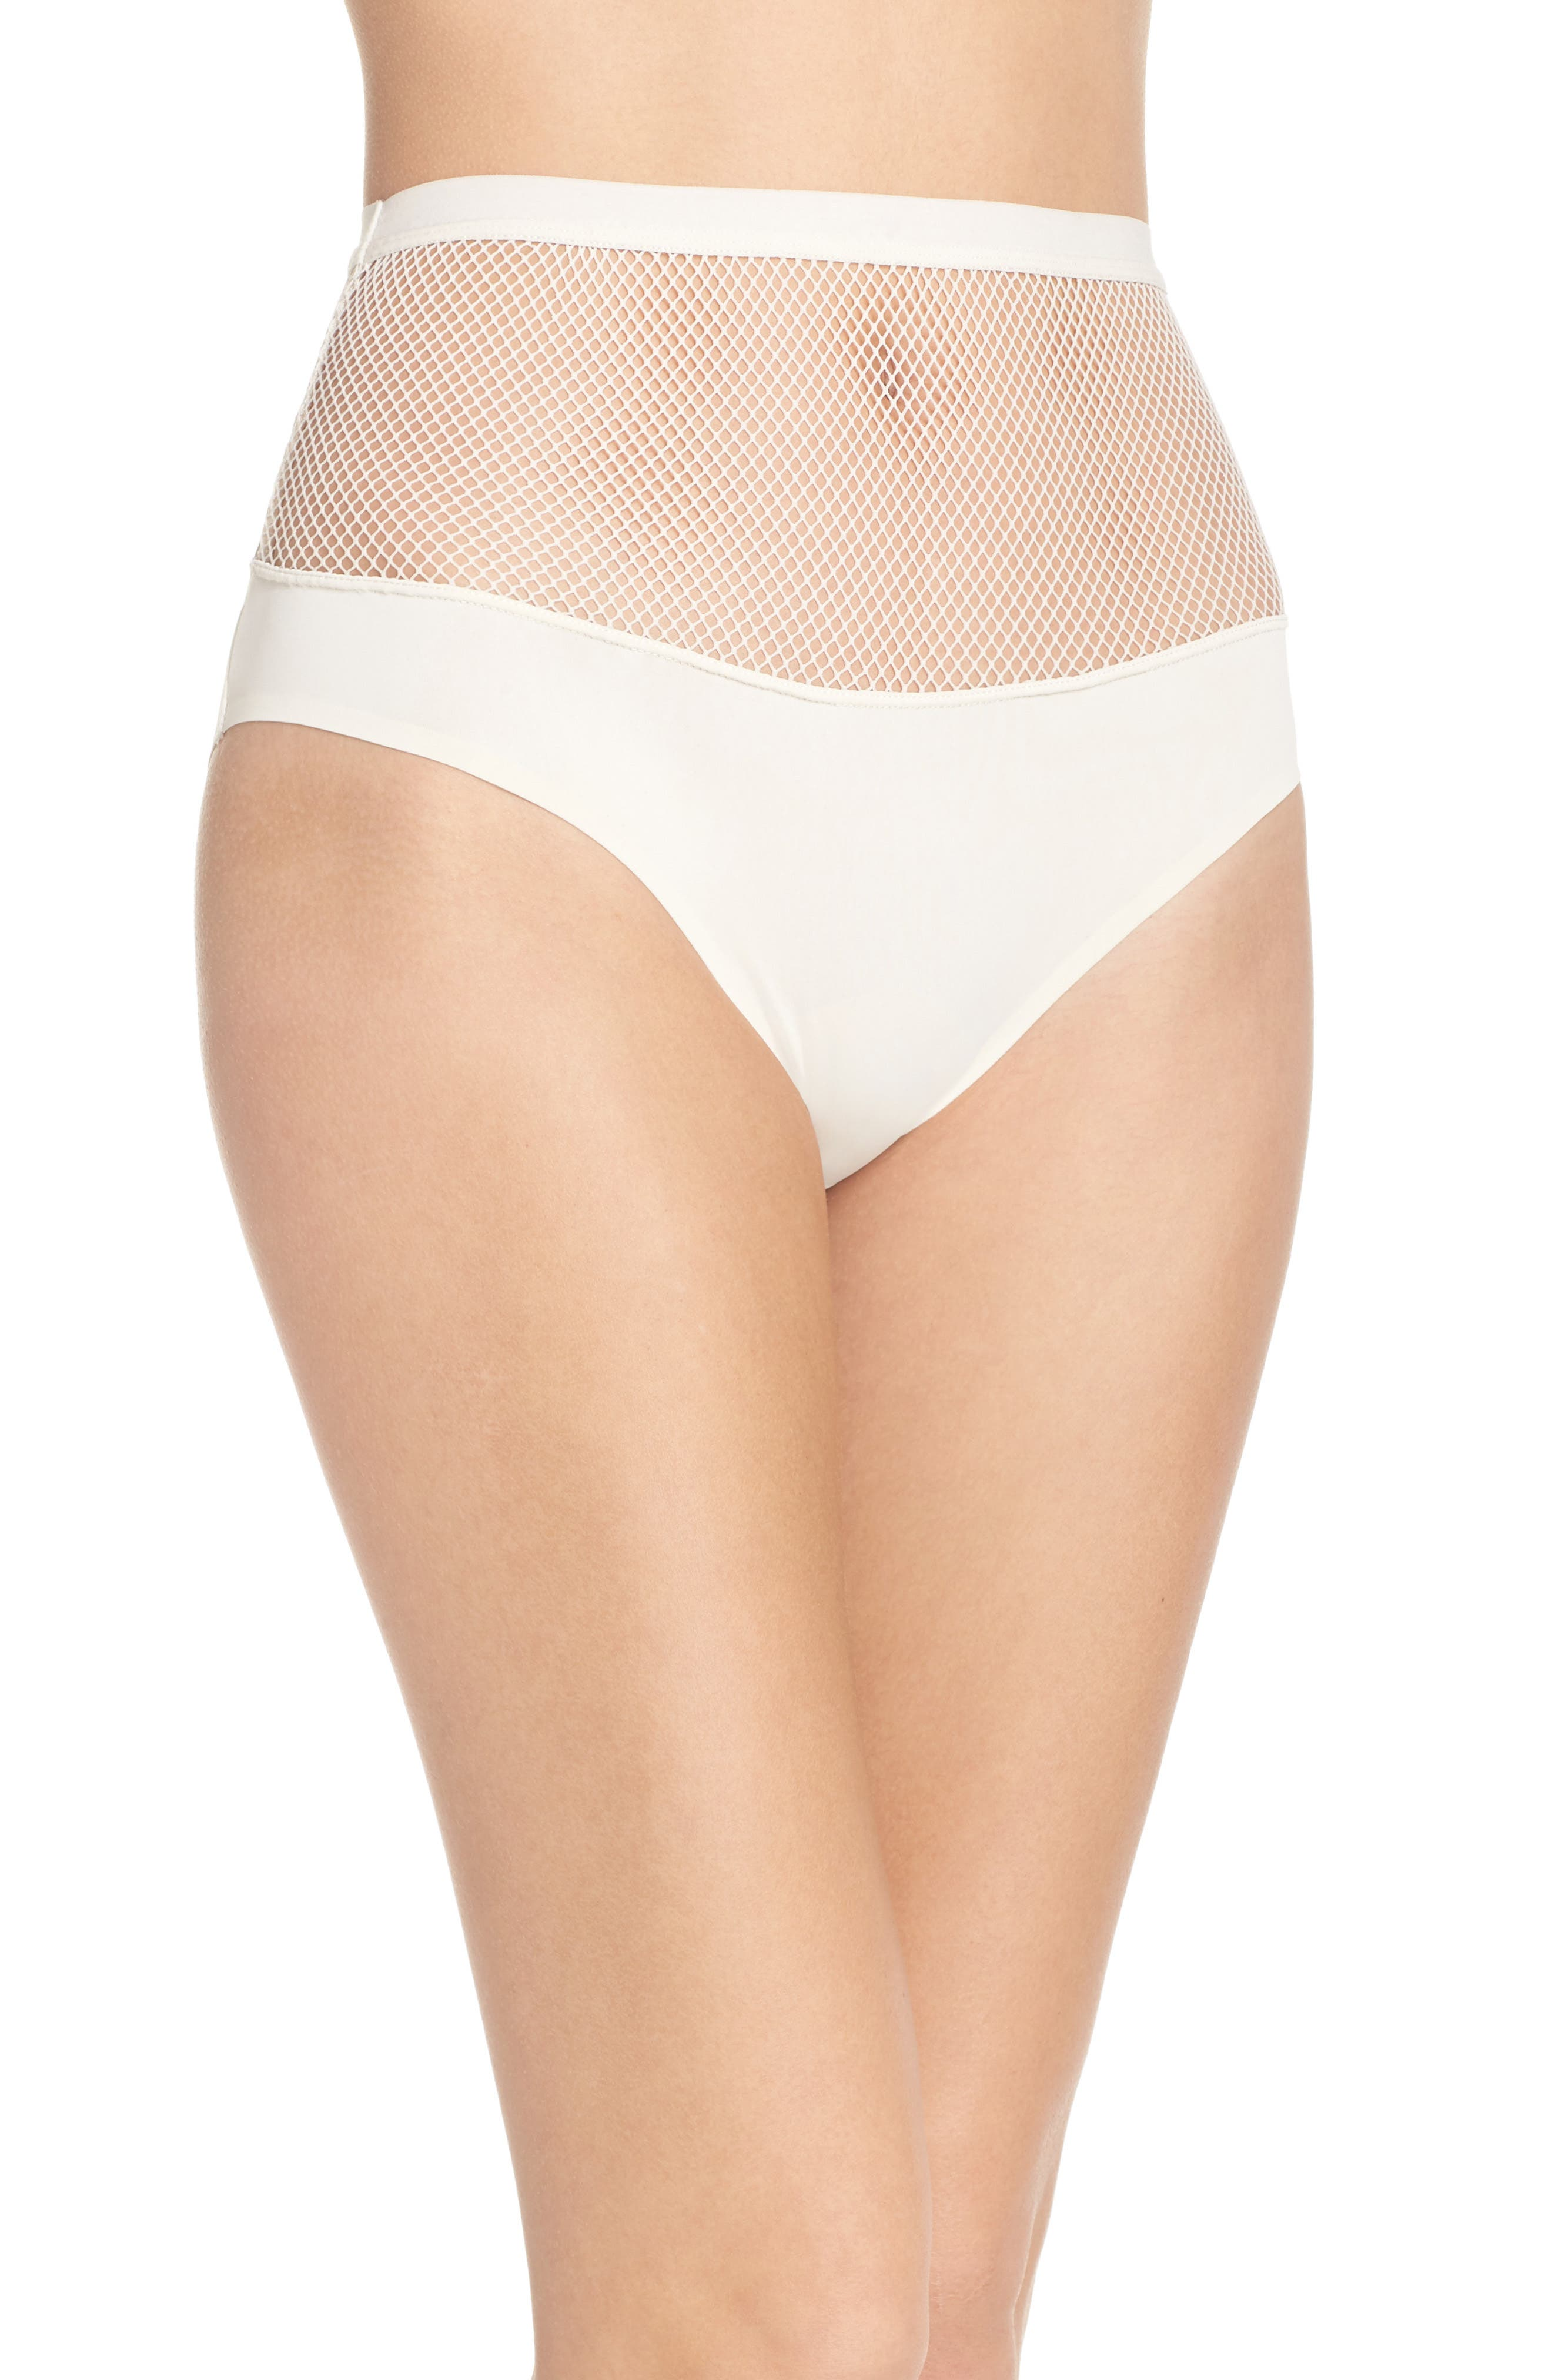 Honeydew Fishnet Hipster Panties,                         Main,                         color, Macrame